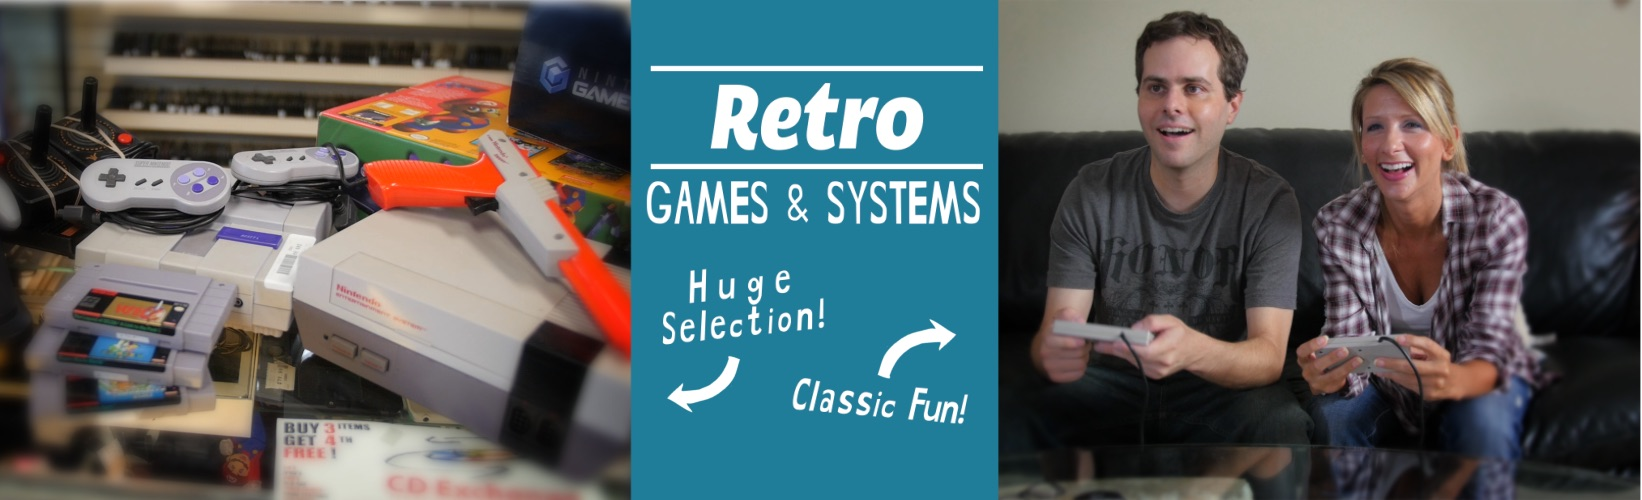 RETRO GAMES REVISED JPEG